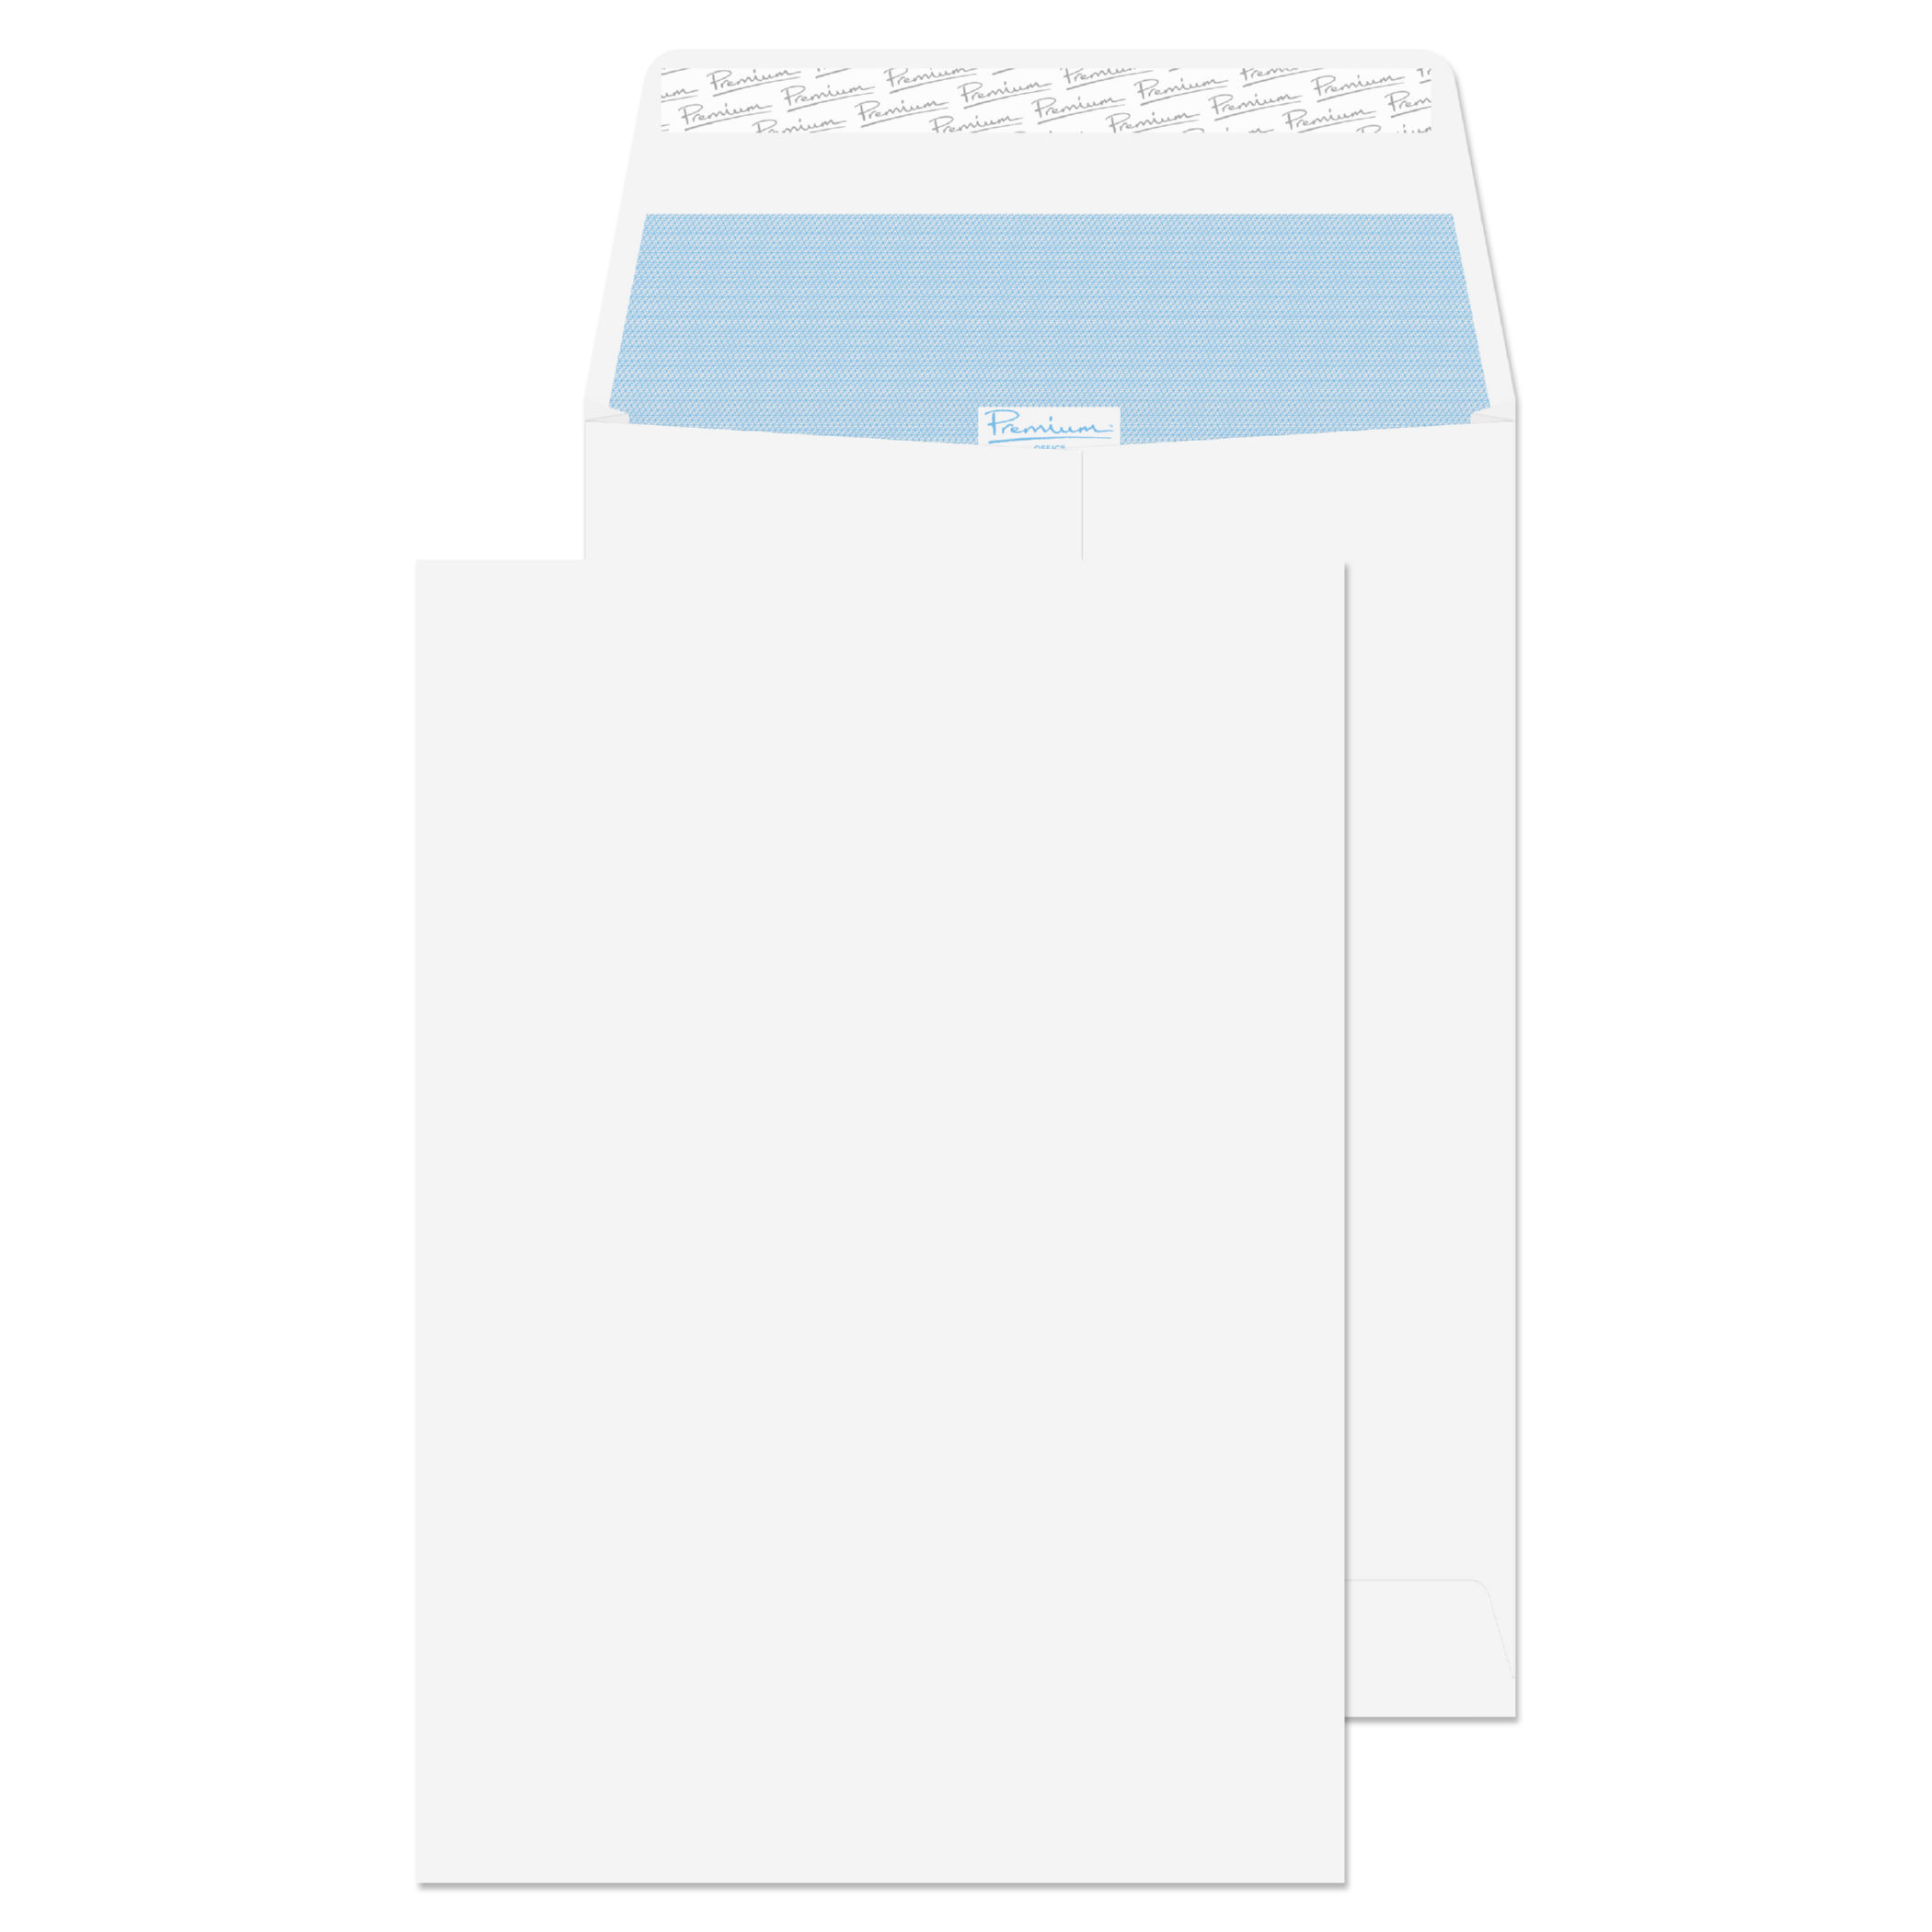 Gusset Envelopes Blake Premium Office Pocket Gusset Envelope C4 Peel and Seal Plain 25mm Gusset 140gsm White Wove (Pack 100)